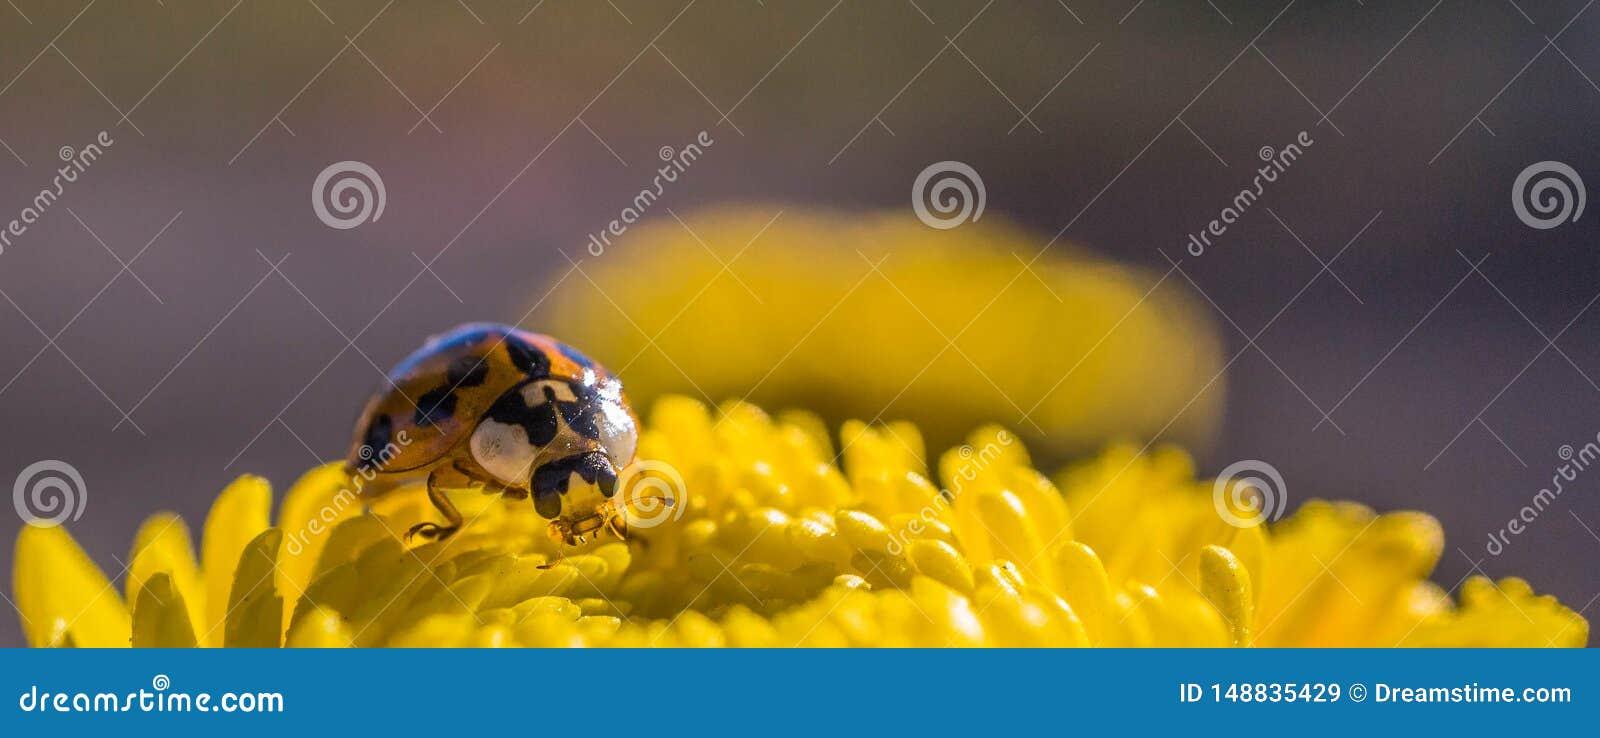 Lieveheersbeestje die op een gele chrysant rusten